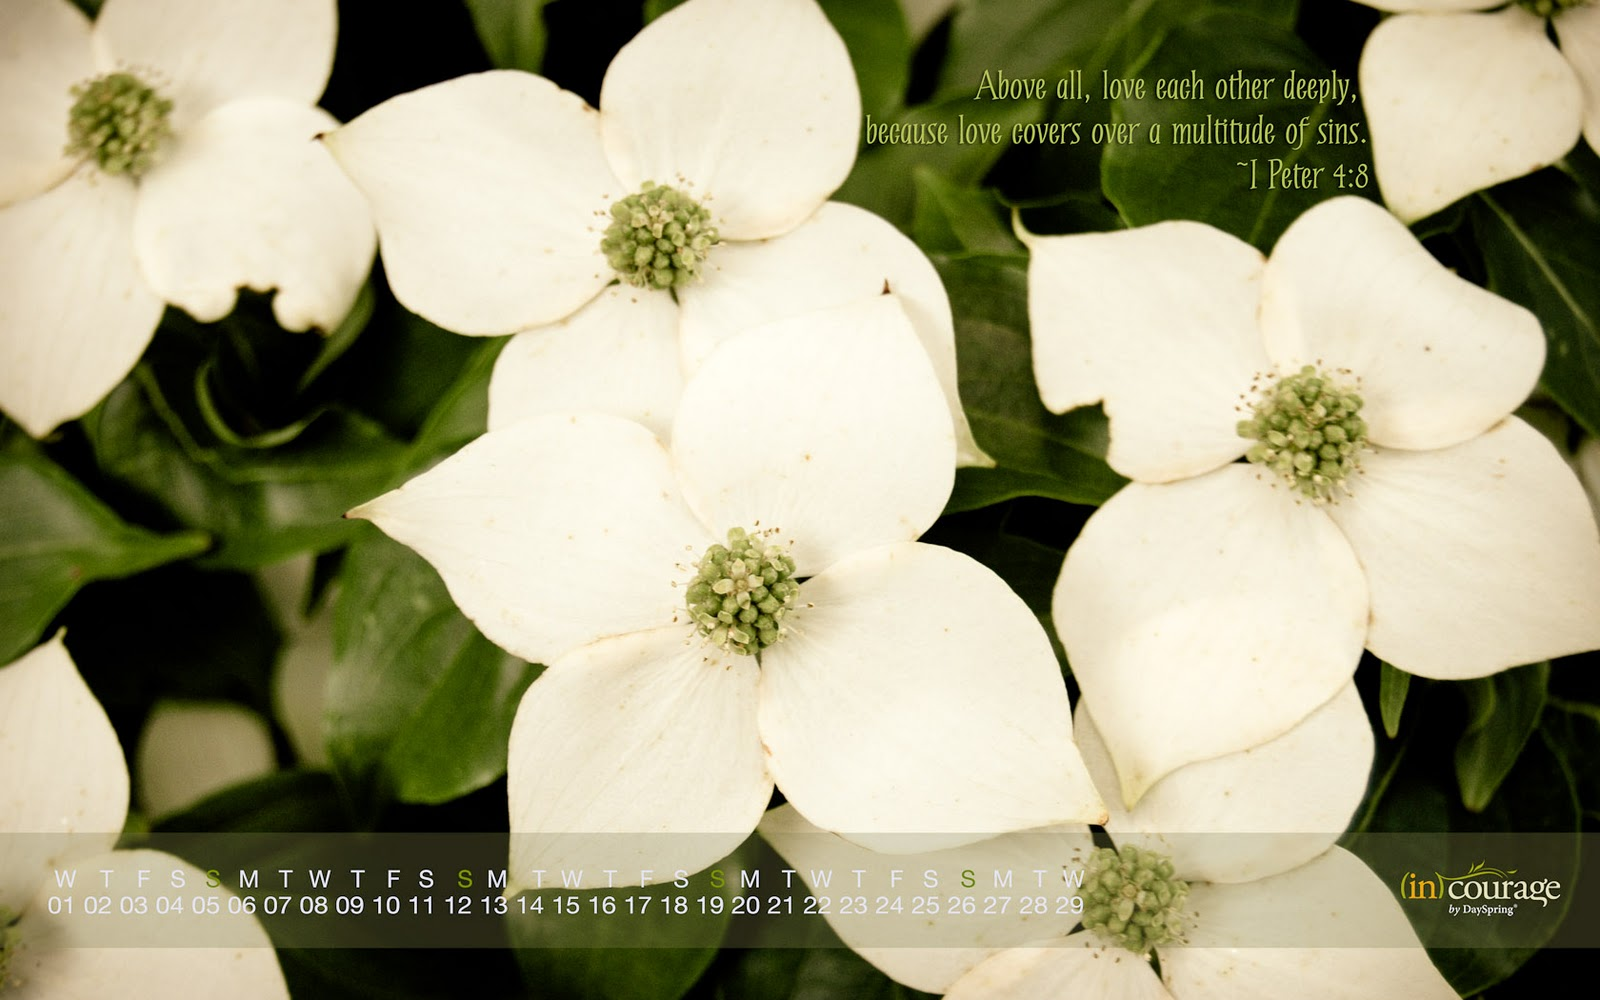 http://3.bp.blogspot.com/-Ha2zwFFq-34/TyoNBHXMyZI/AAAAAAAAE_M/yVrzYMTSlNw/s1600/feb2012cal-1680x1050.jpg